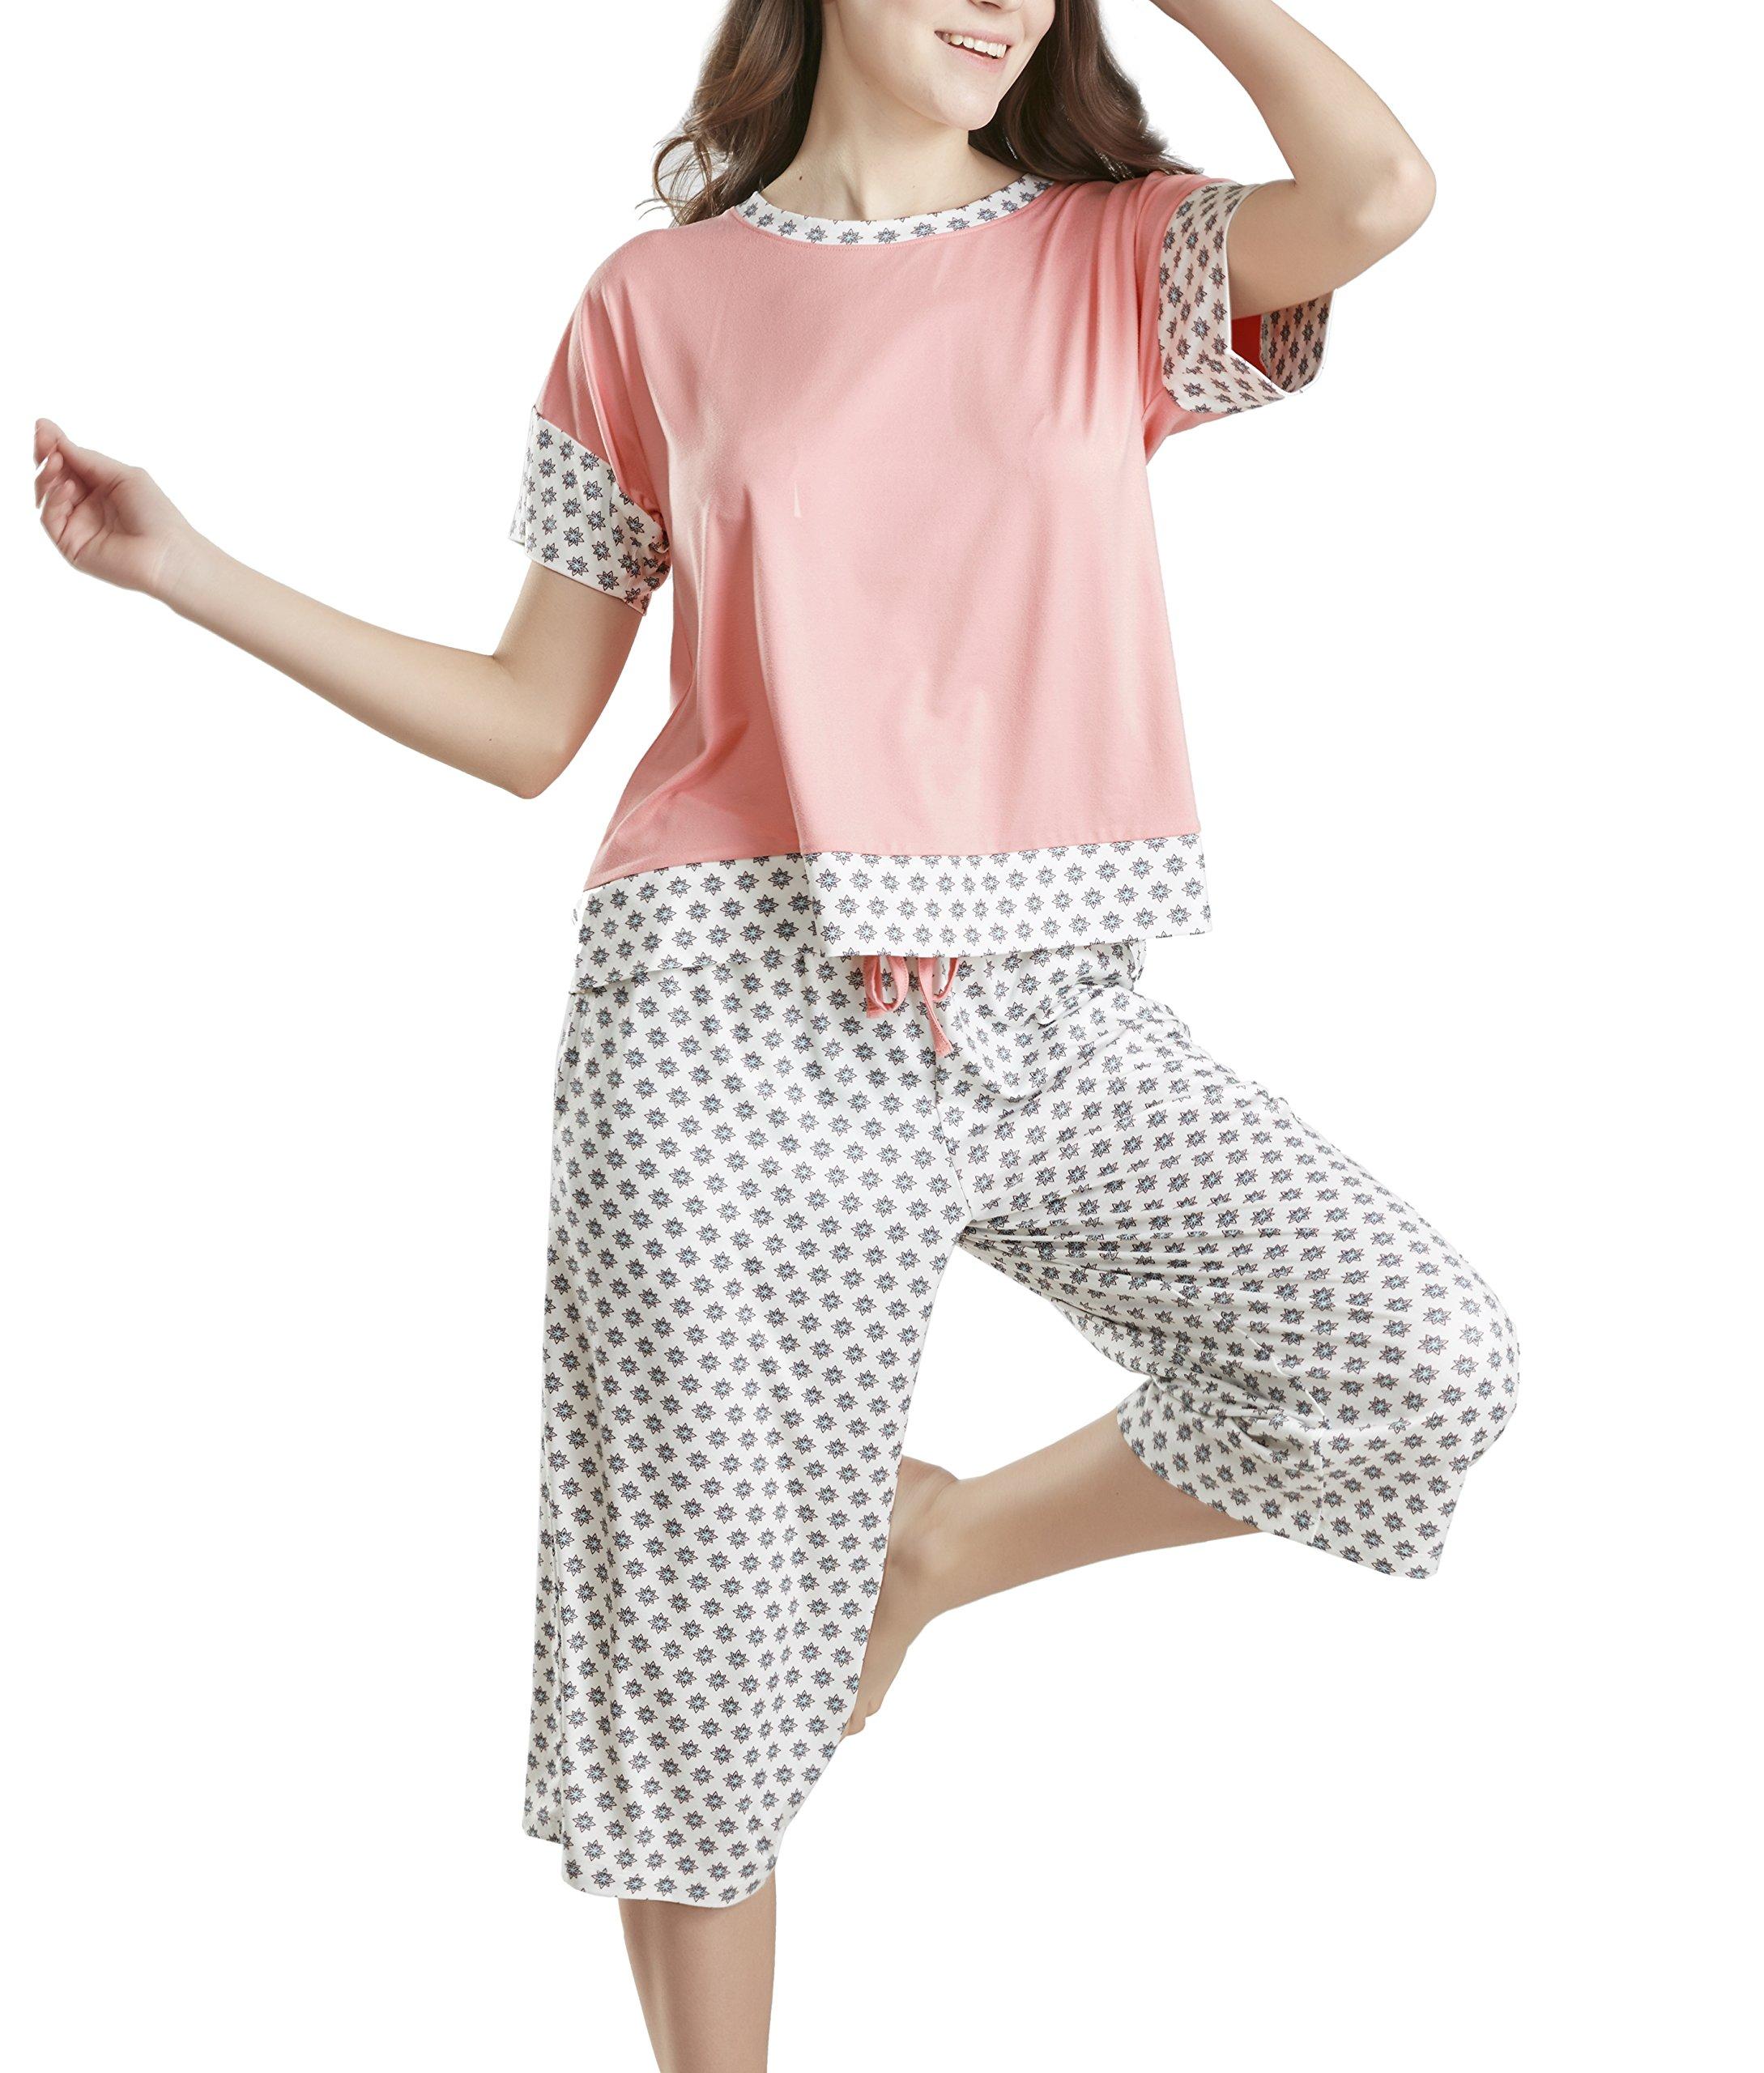 Summer Pajamas for Women, Stylish Print Ladies Pajama Set - Nightlight Oversized Shirt and Capri Lounge Pants X Large